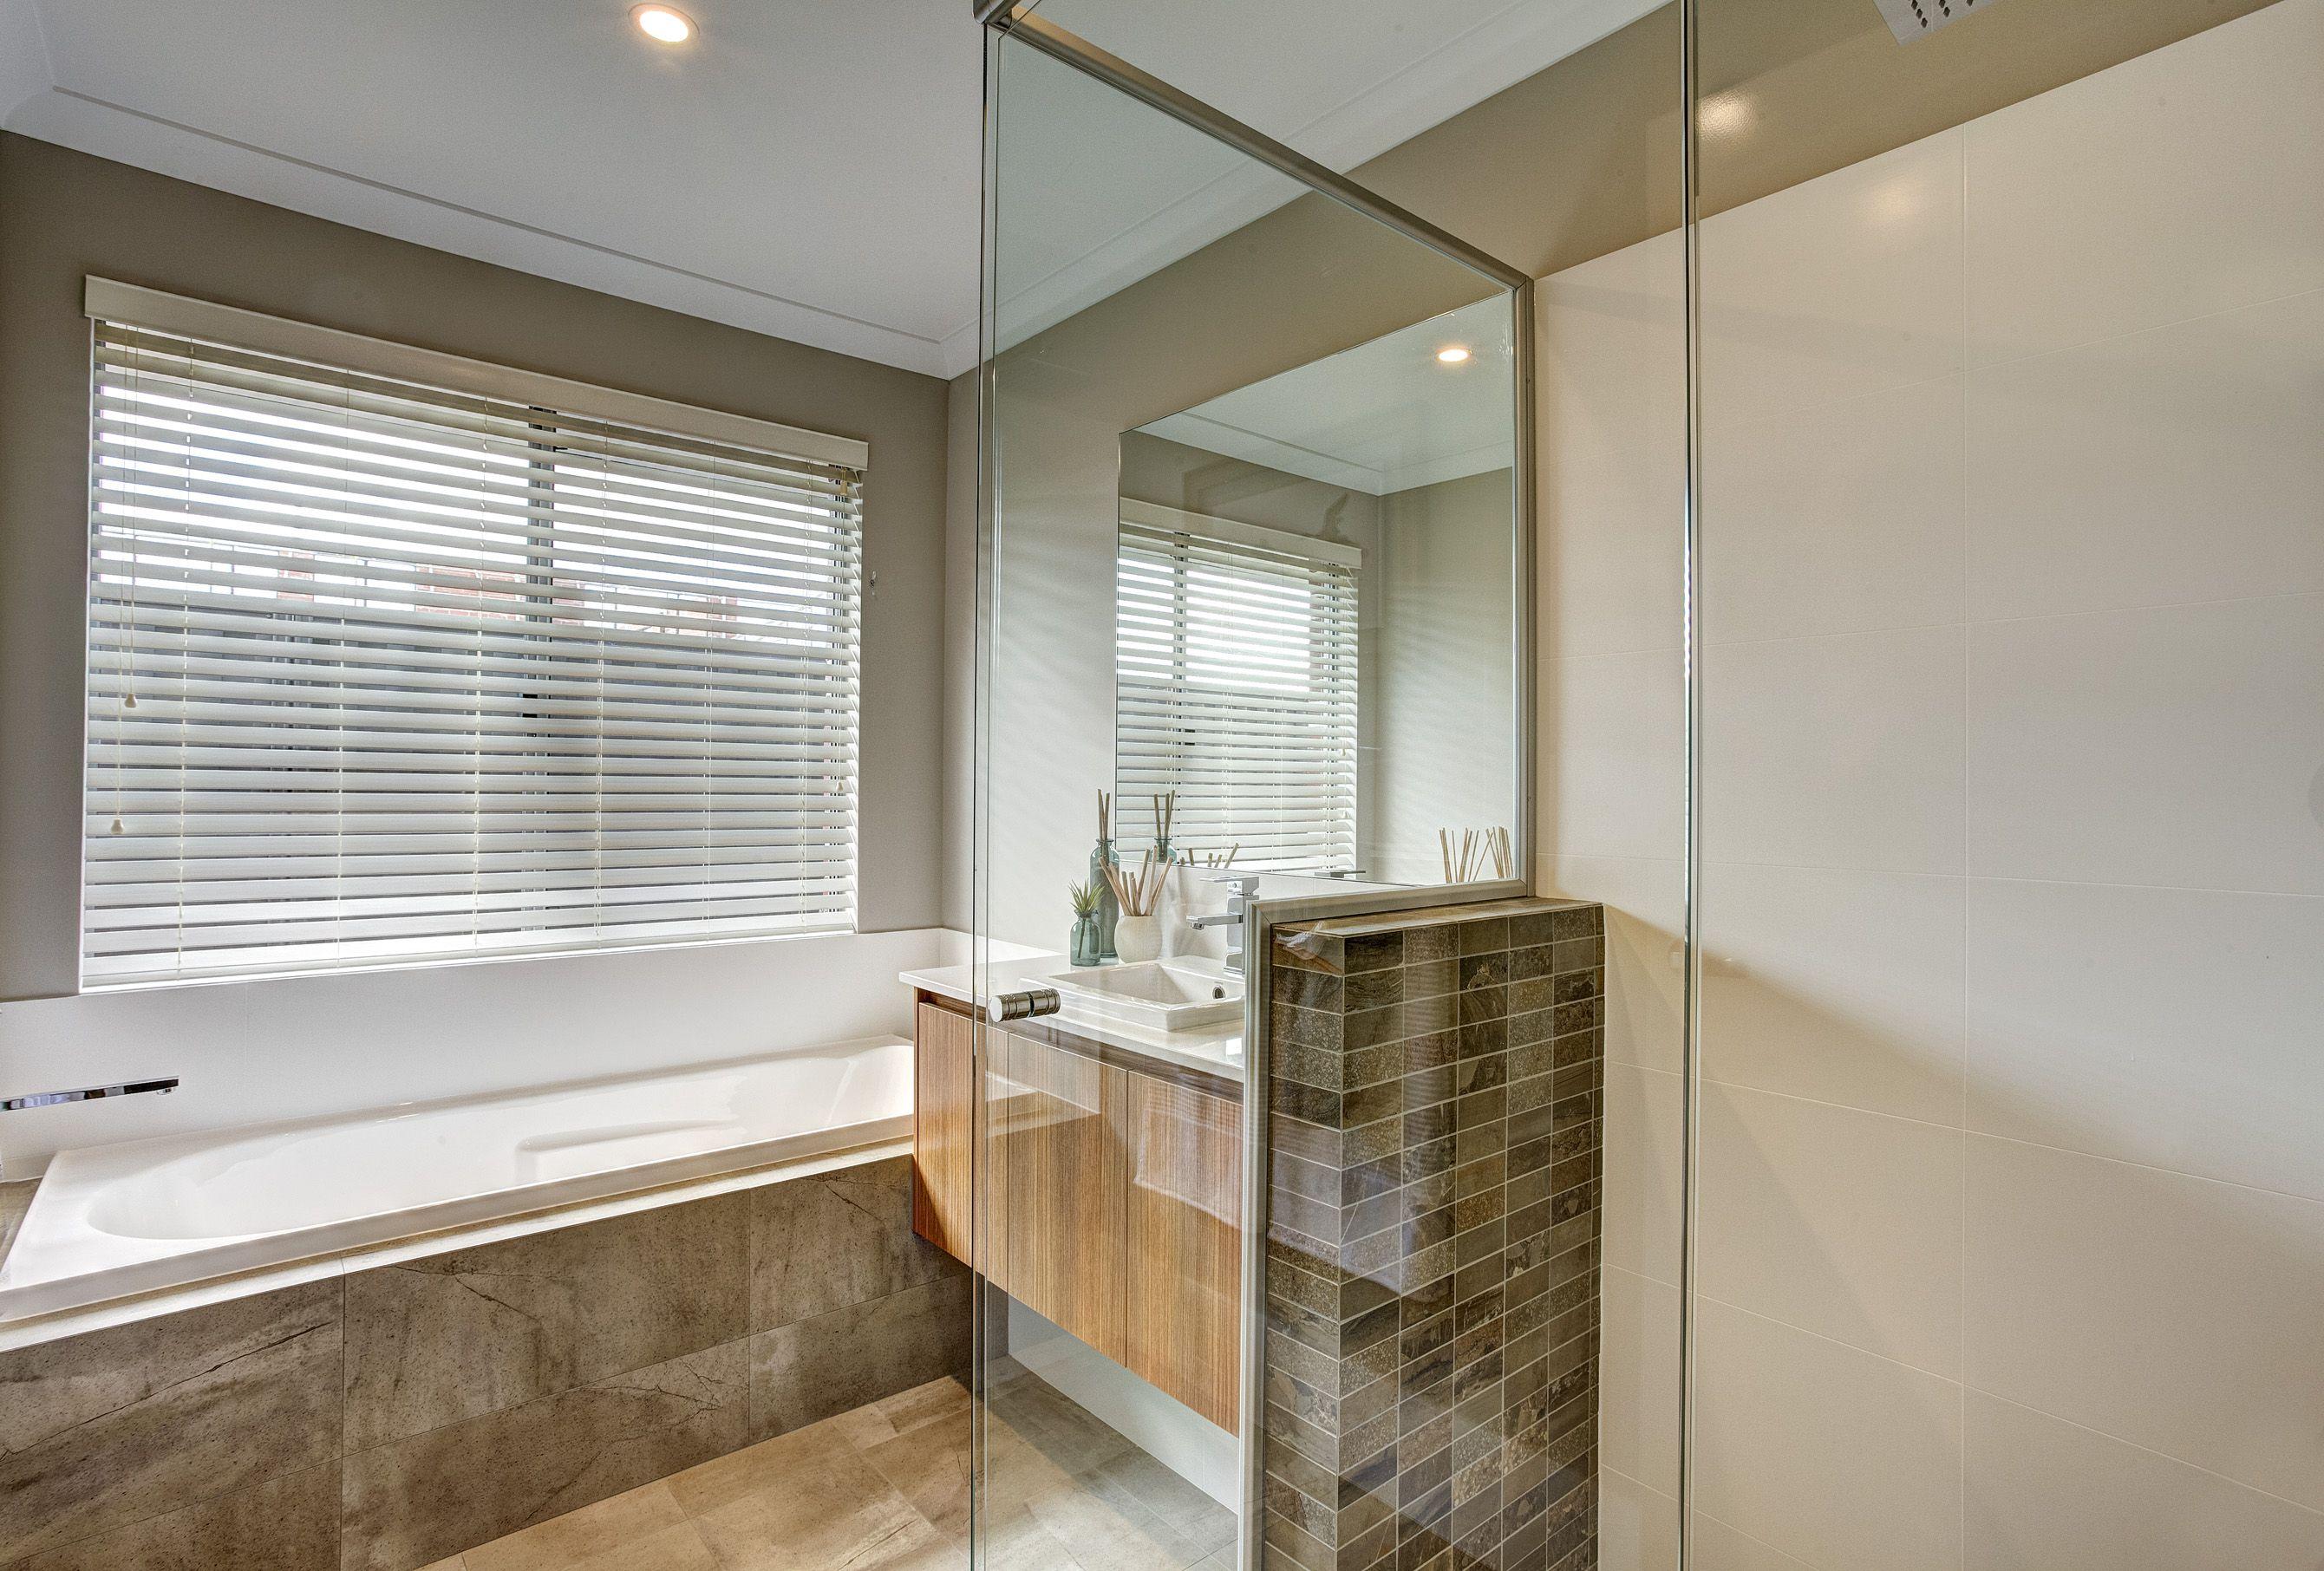 the alkira displaysummit homes wa. bathrooms to envy! we love